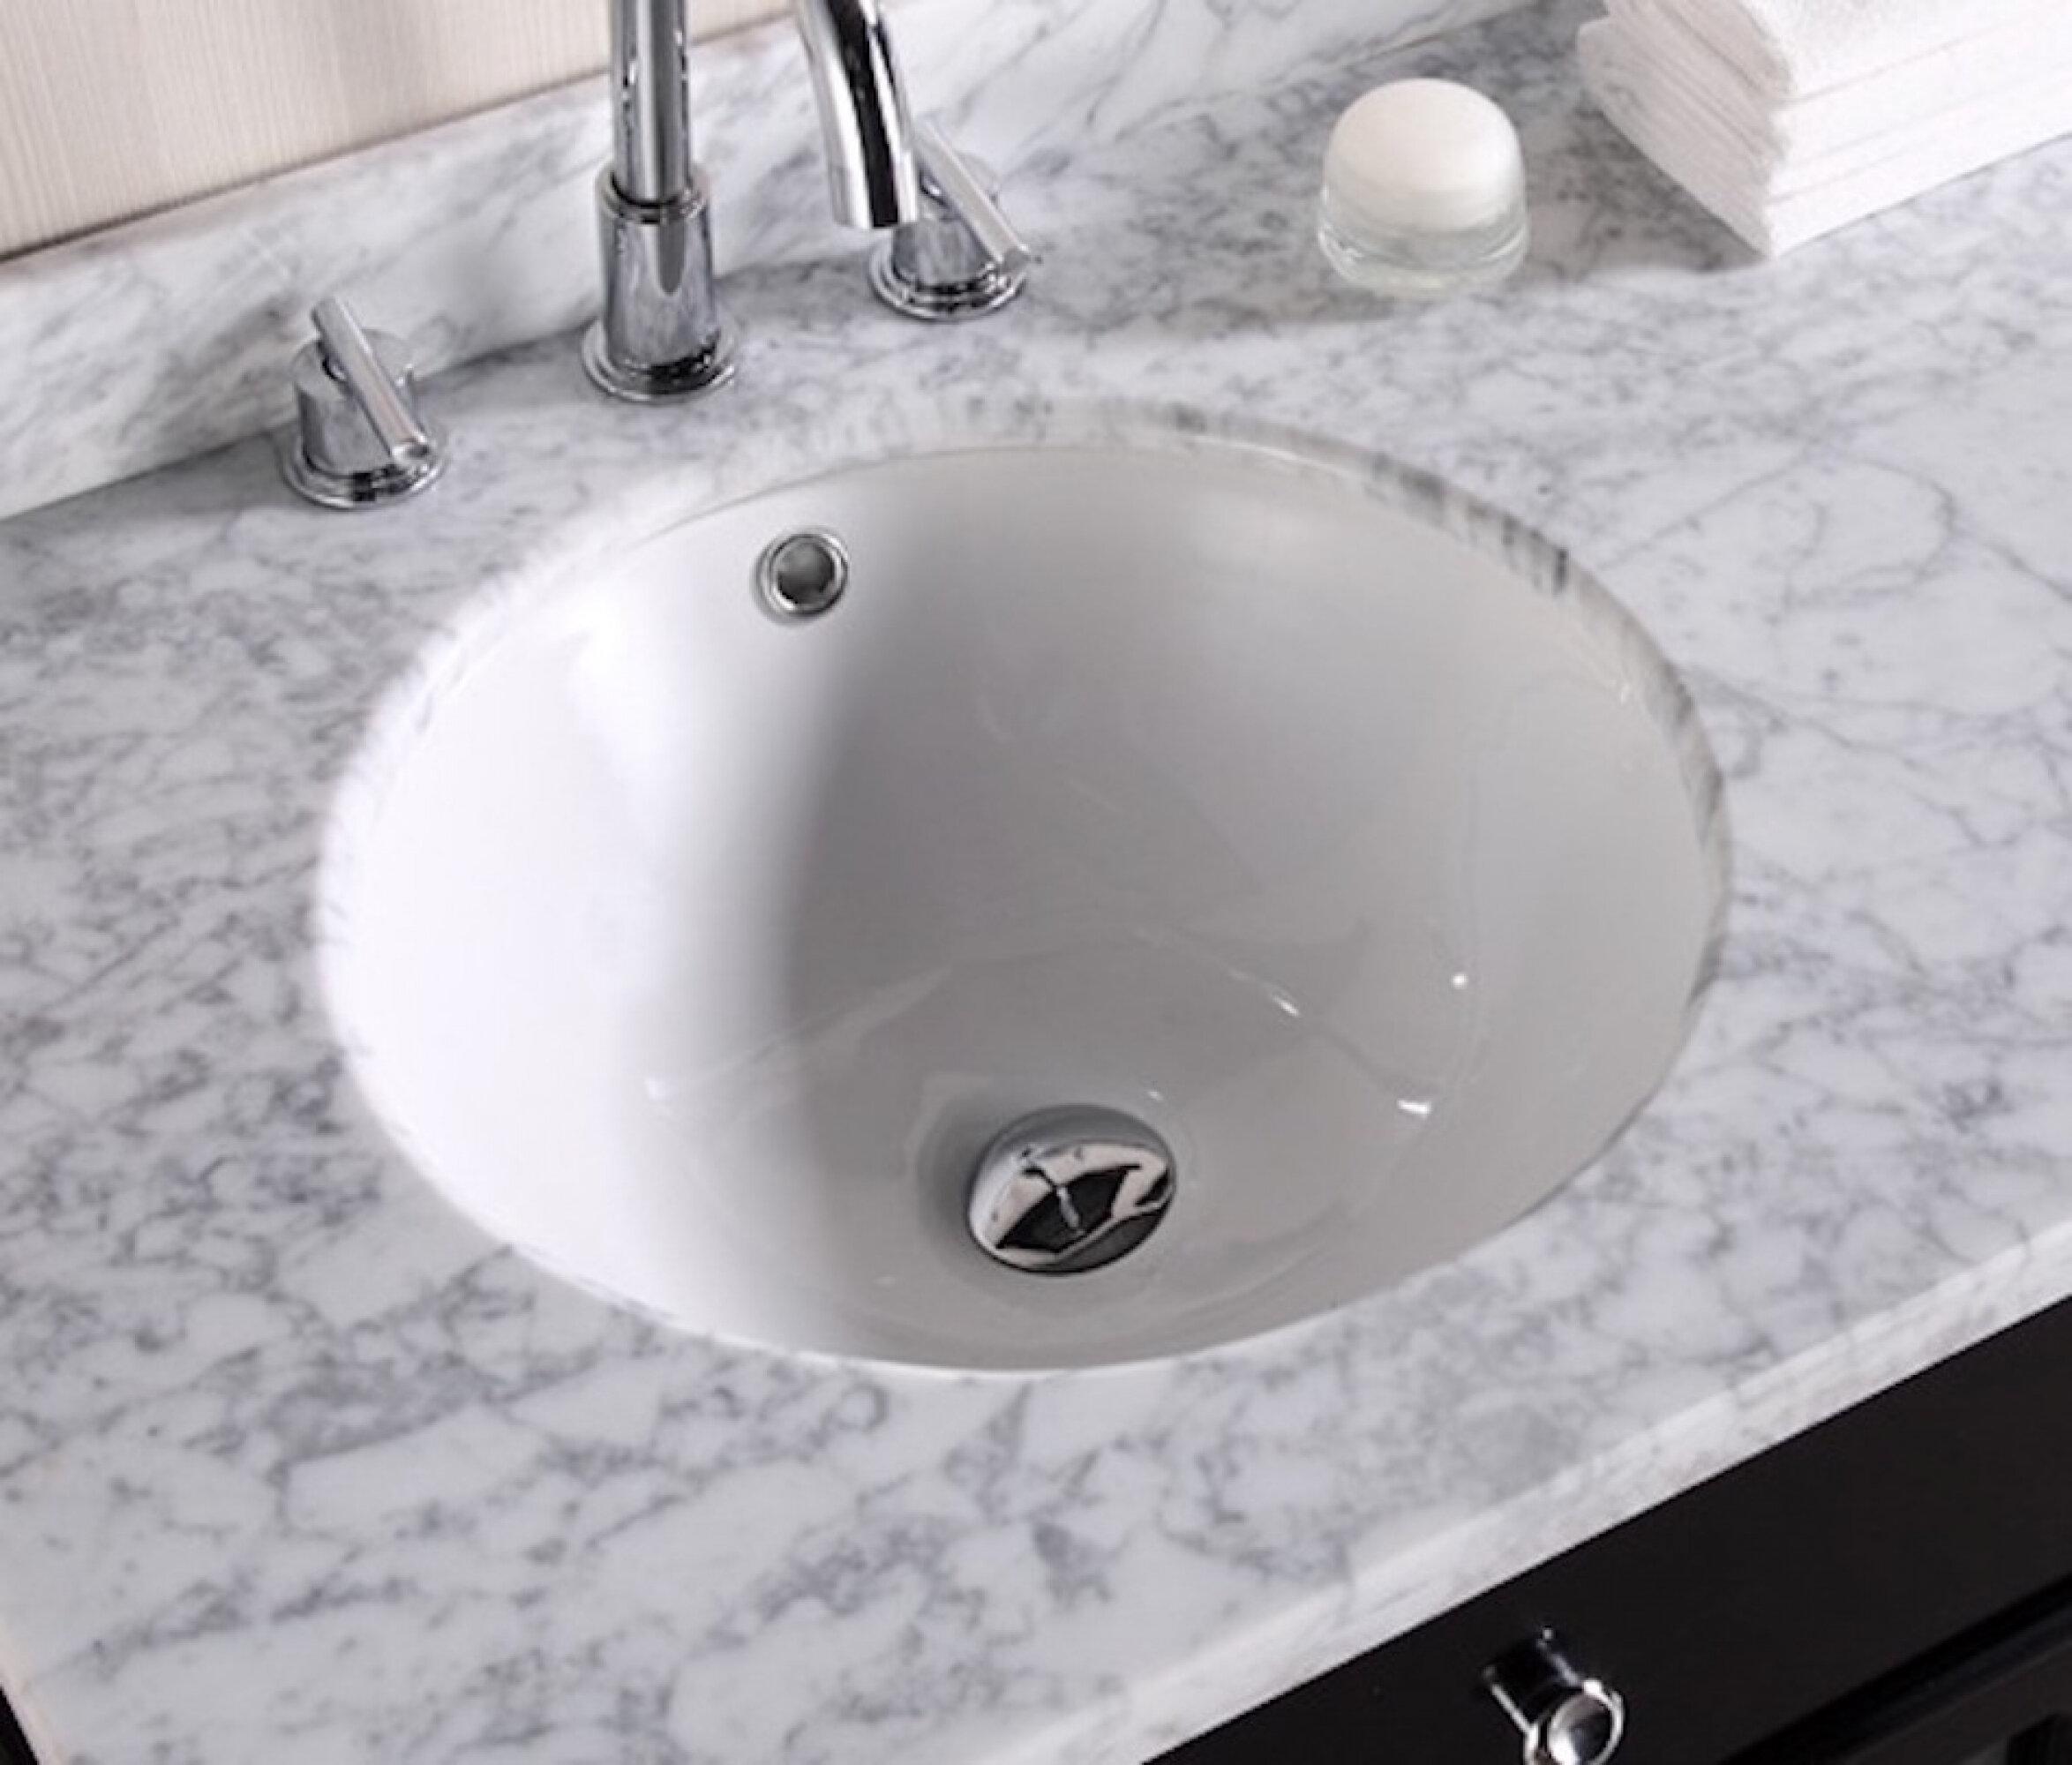 Royalpurplebathkitchen Ceramic Circular Undermount Batroom Sink With Overflow Wayfair